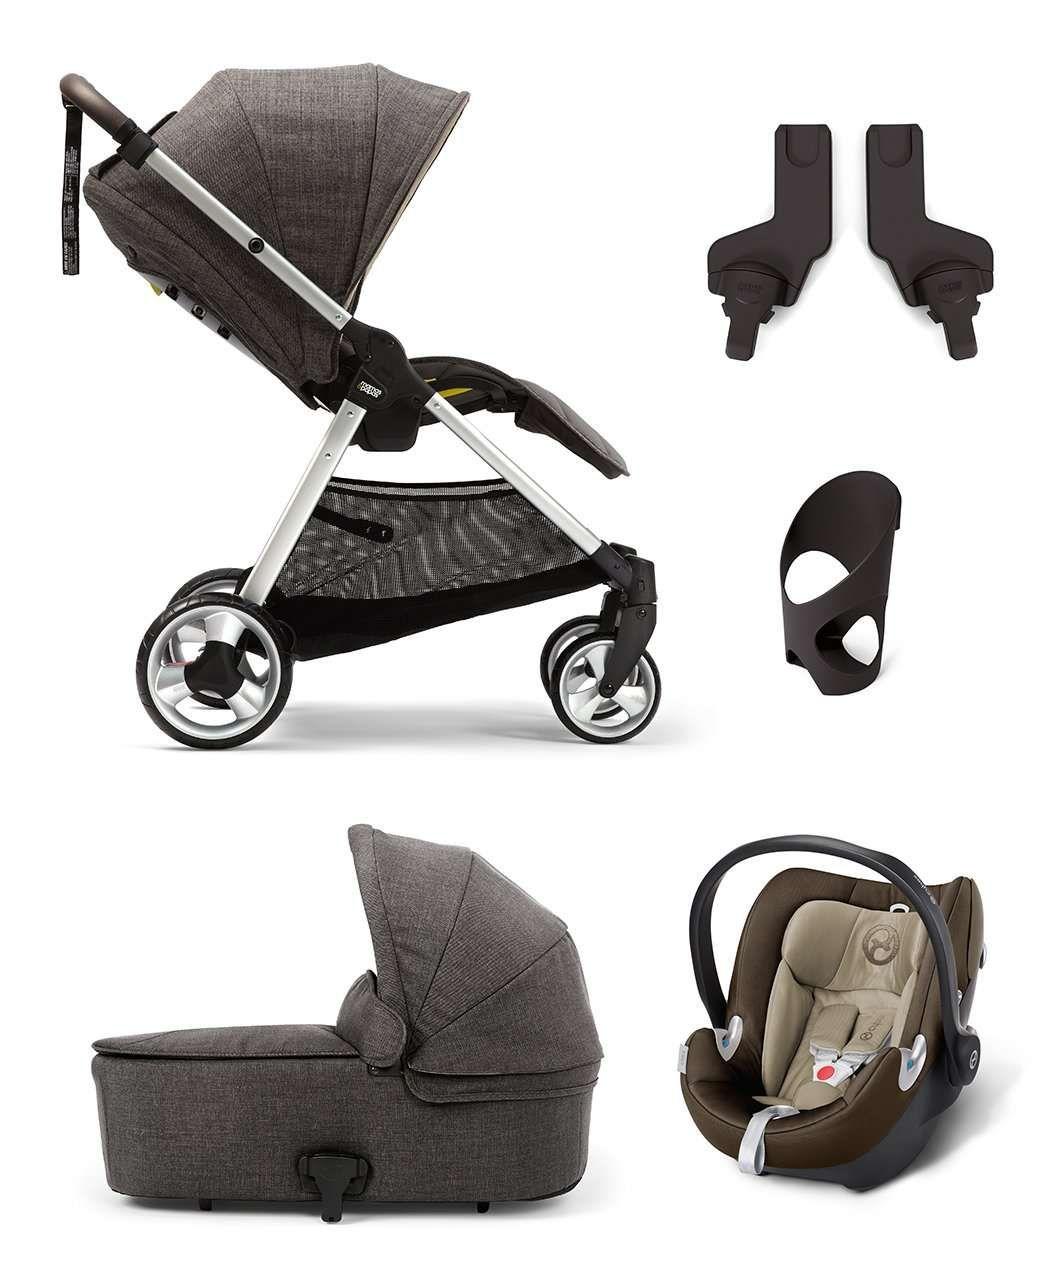 Armadillo Flip Xt 5 Piece Bundle Chestnut Travel Systems Mamas Papas Mamas And Papas Pushchair Baby Accessories